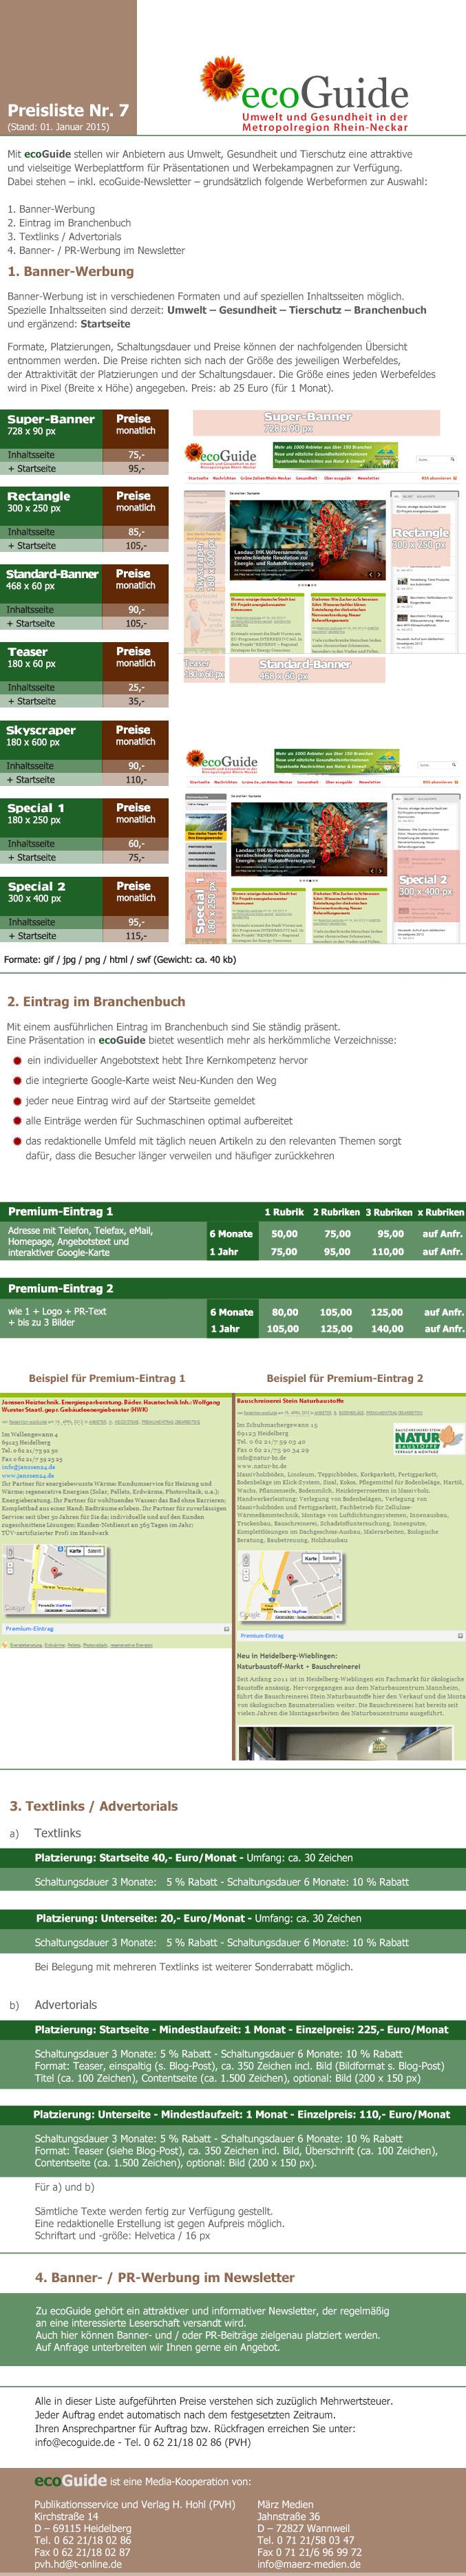 ecoGuide - Mediadaten - Stand: 1. Januar 2015